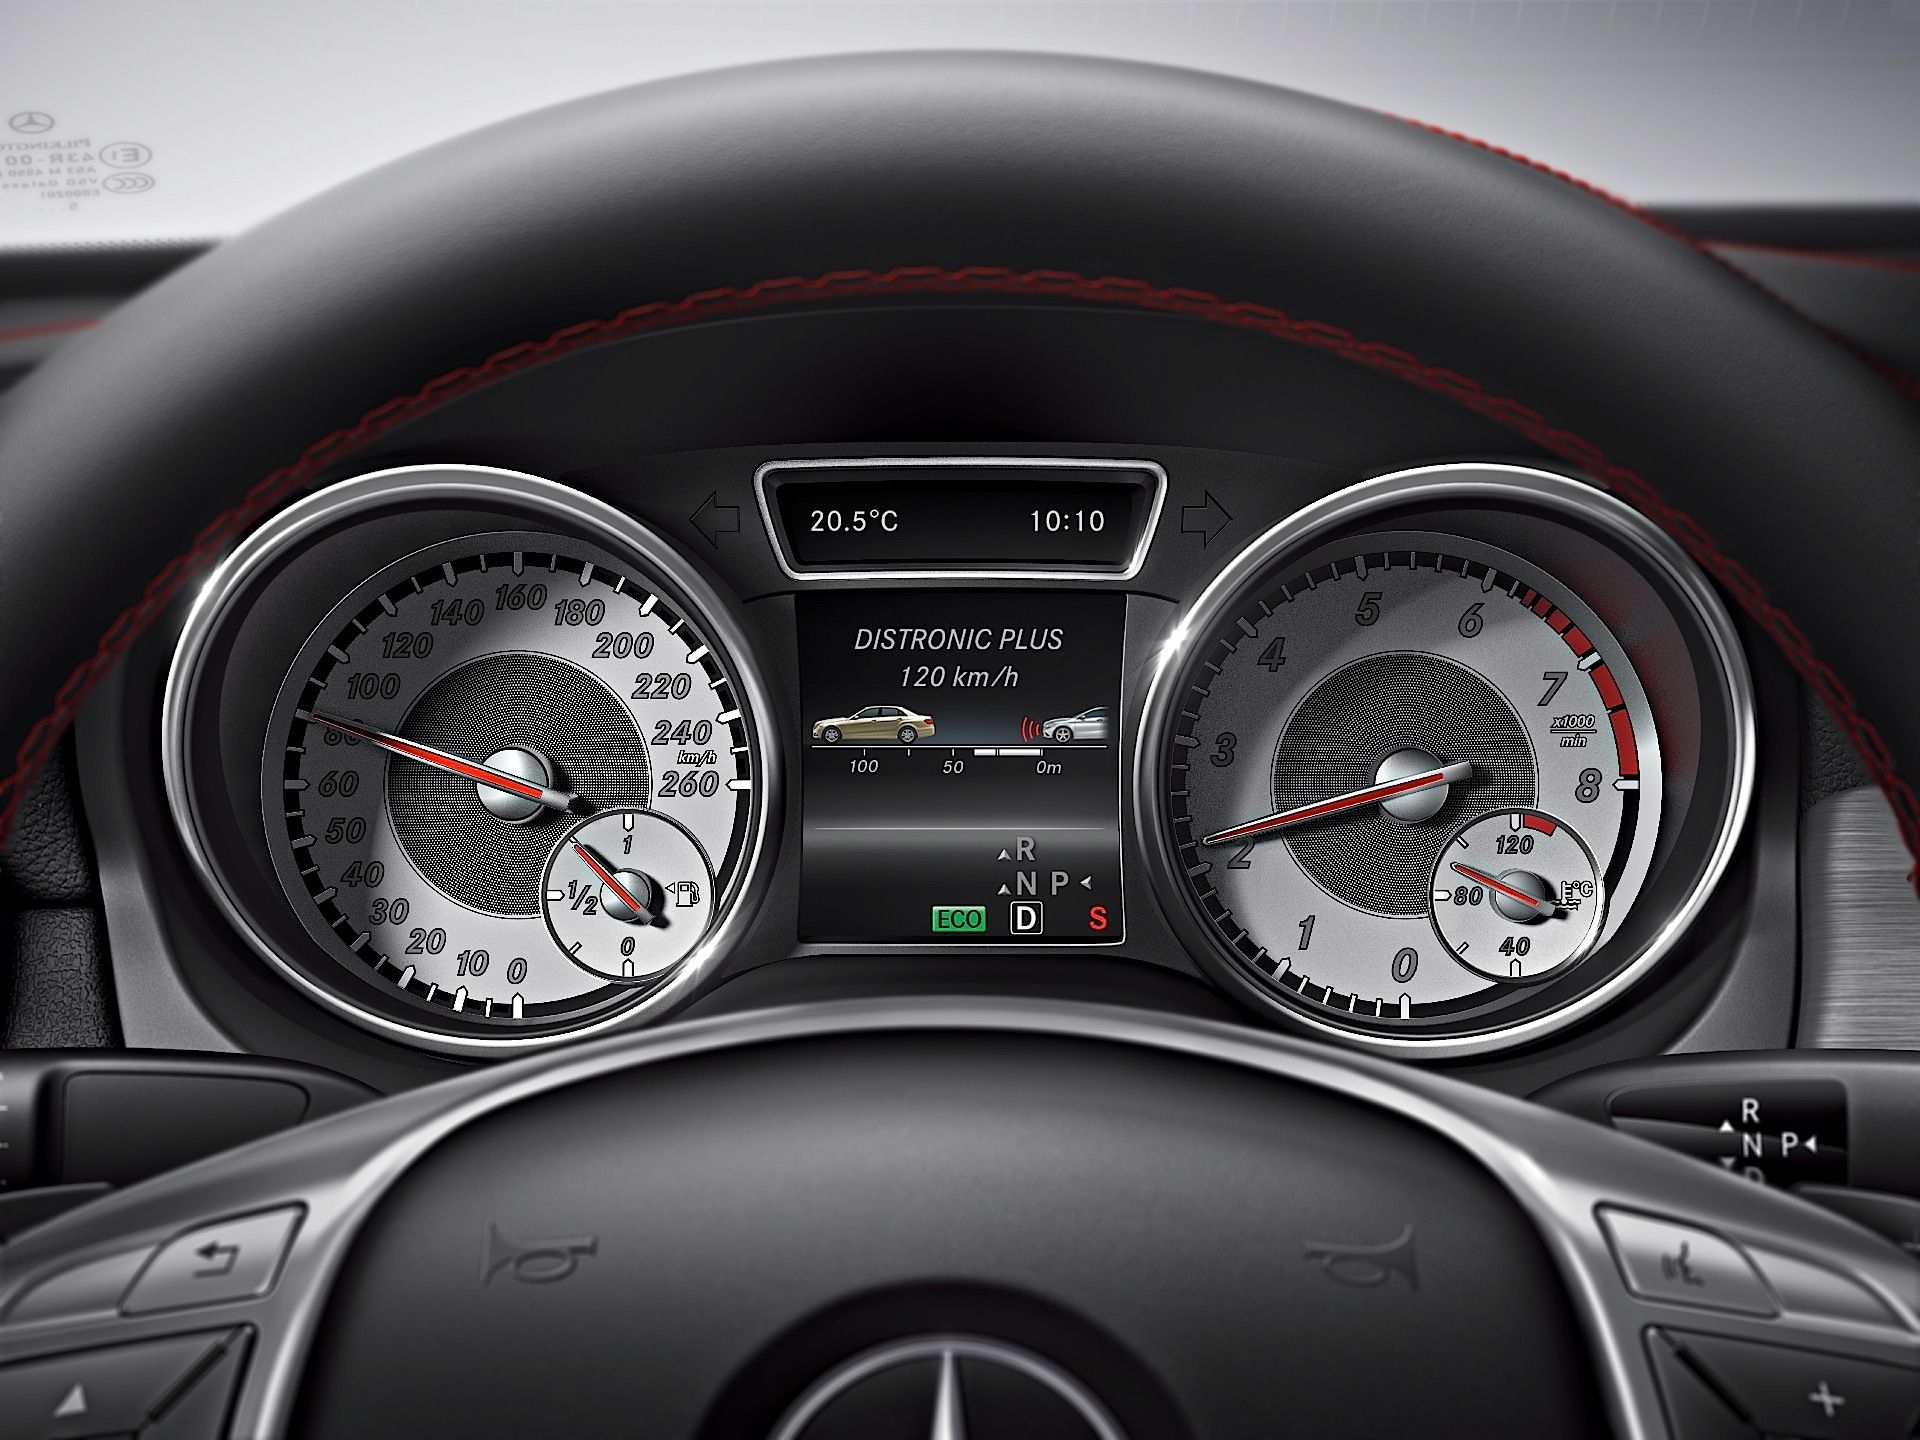 Mercedes benz cla 2013 interior mercedes benz cla 45 amg 2013 2014